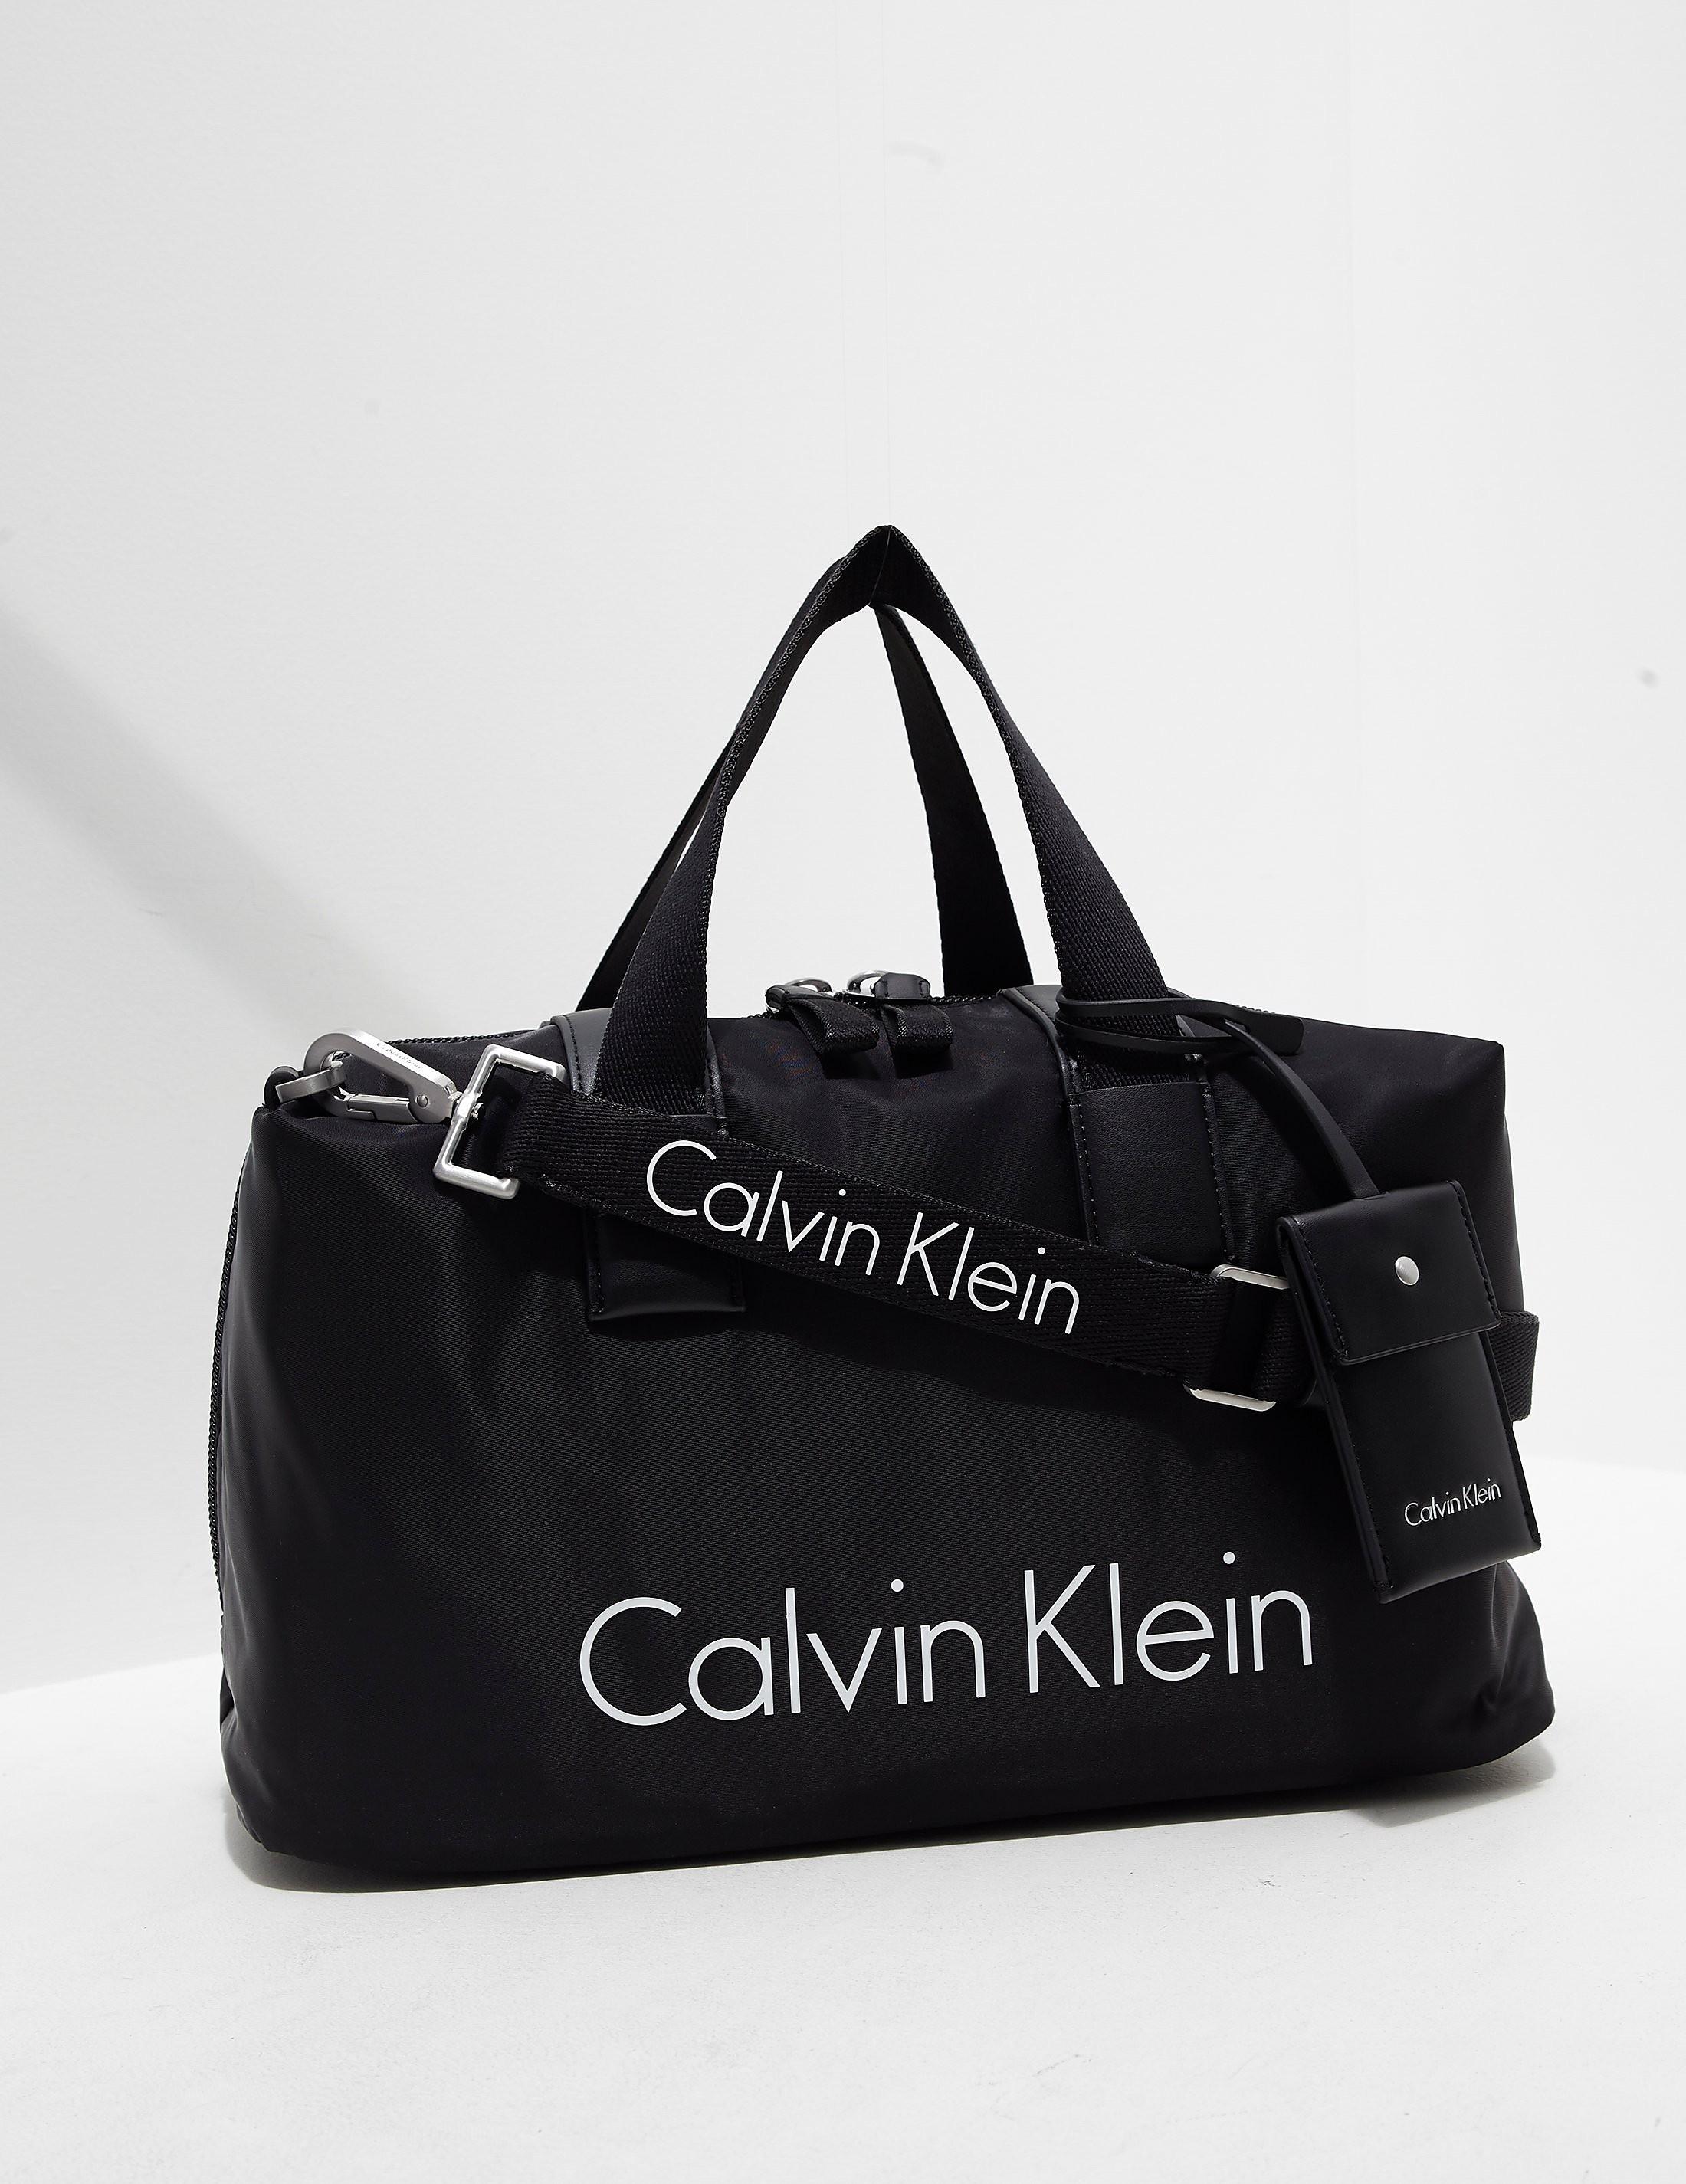 Calvin Klein Nylon Duffle Bag